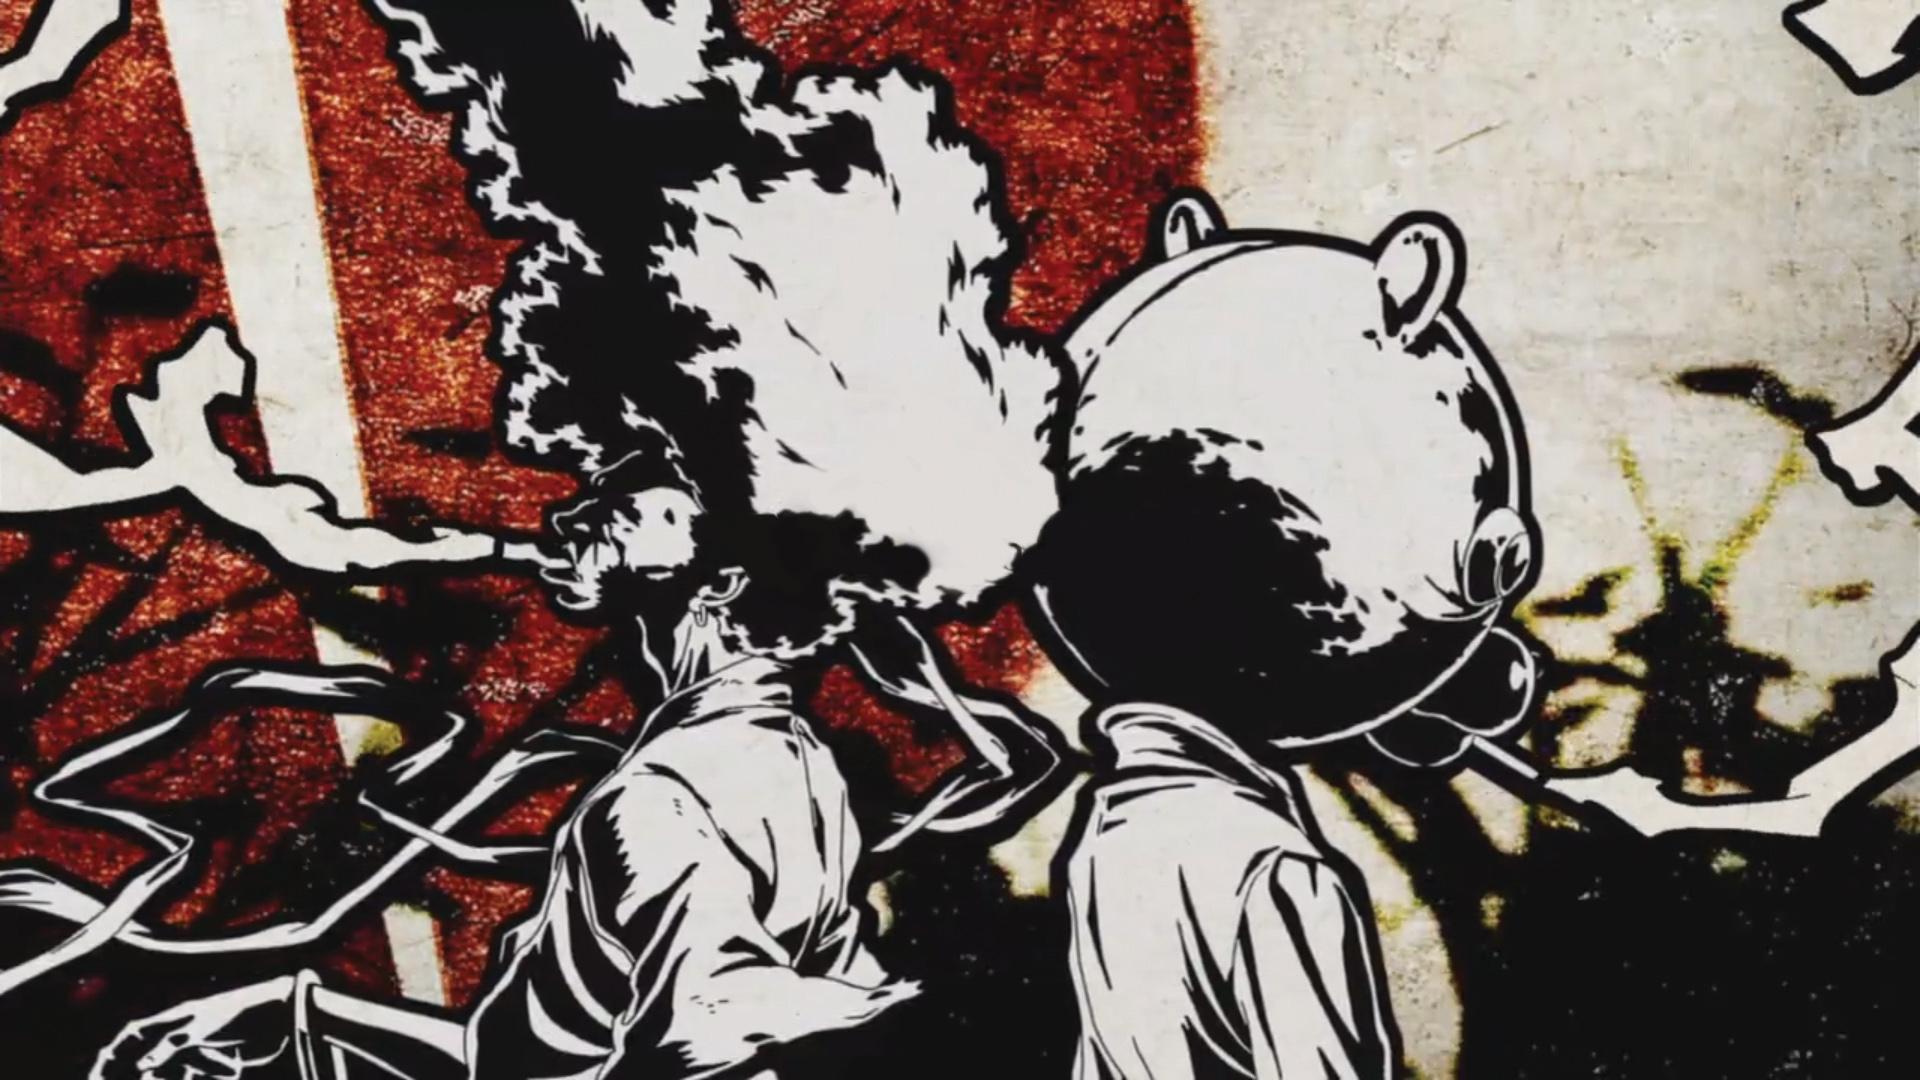 wallpaper.wiki-afro-samurai-hd-wallpaper-pic-wpc002270 - wallpaper.wiki